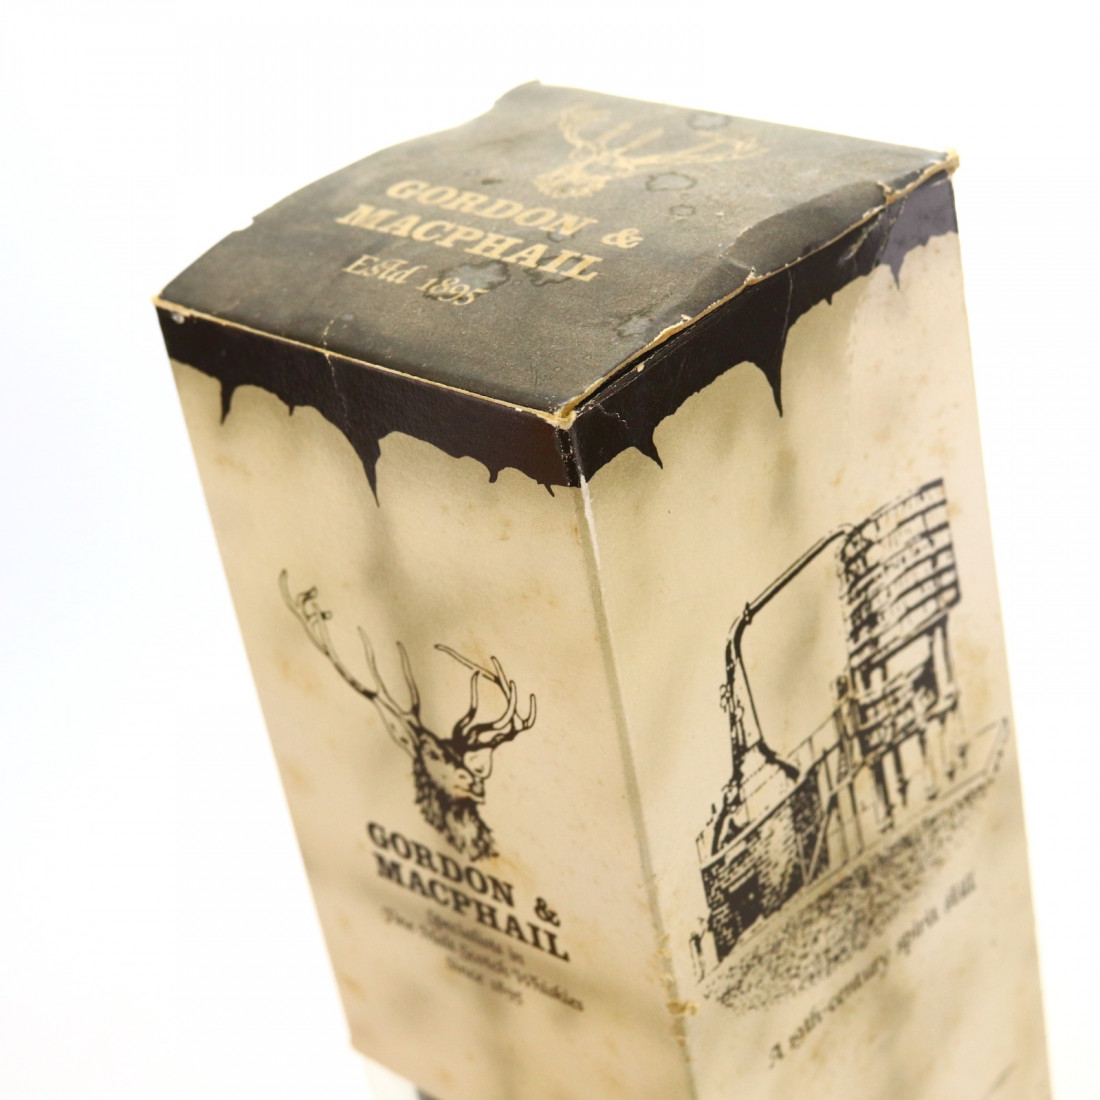 Laphroaig 1969 Gordon and MacPhail Celtic Label / Meregalli Import